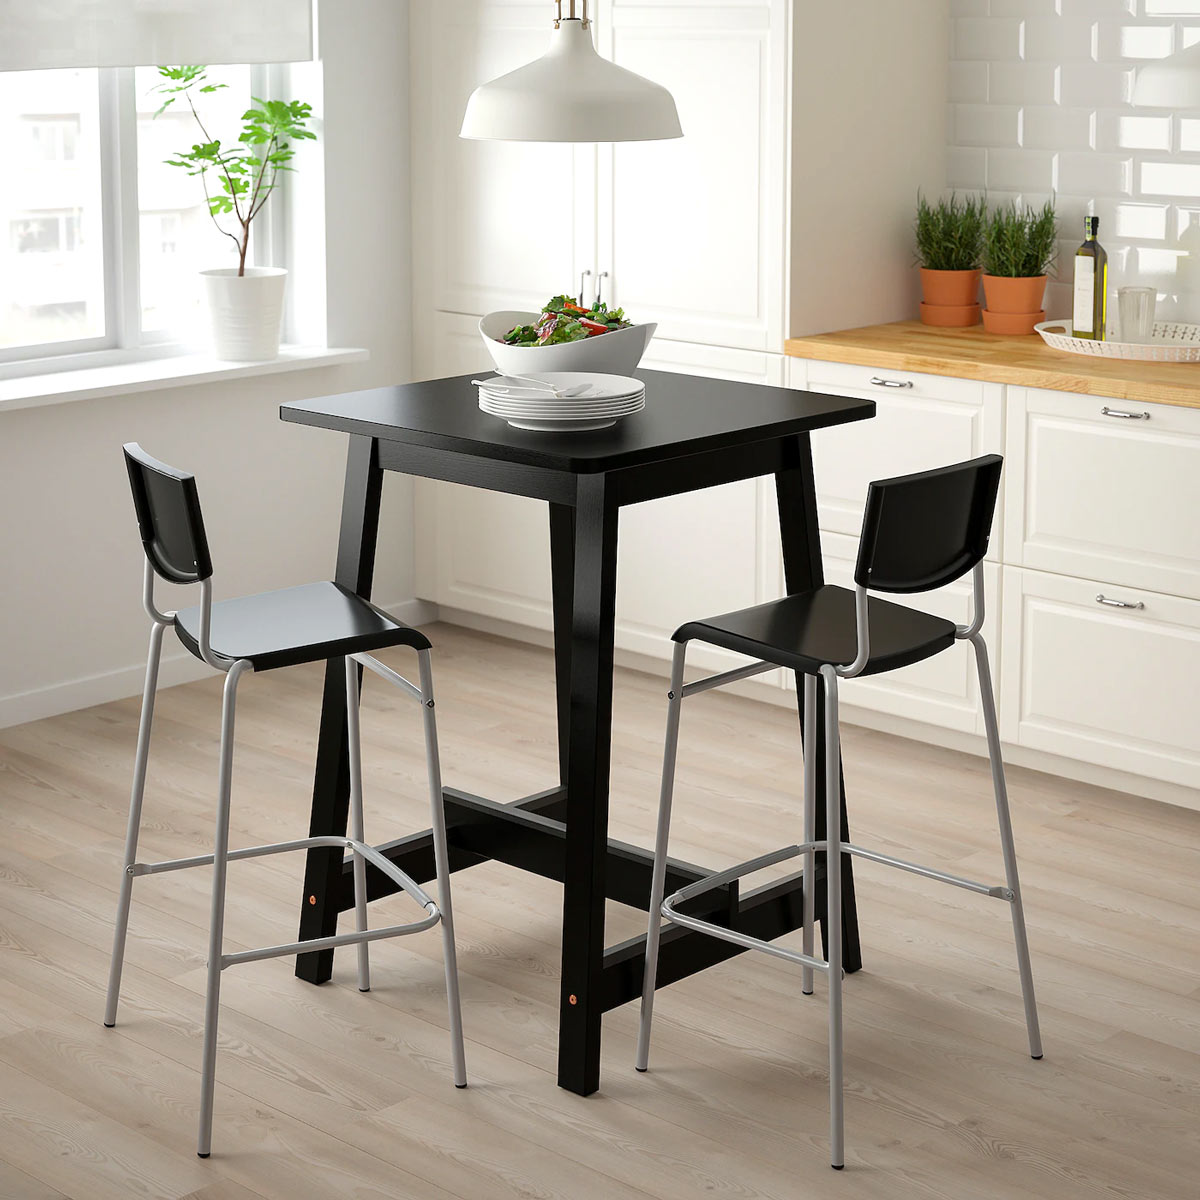 Offerte fine serie IKEA marzo 2021.